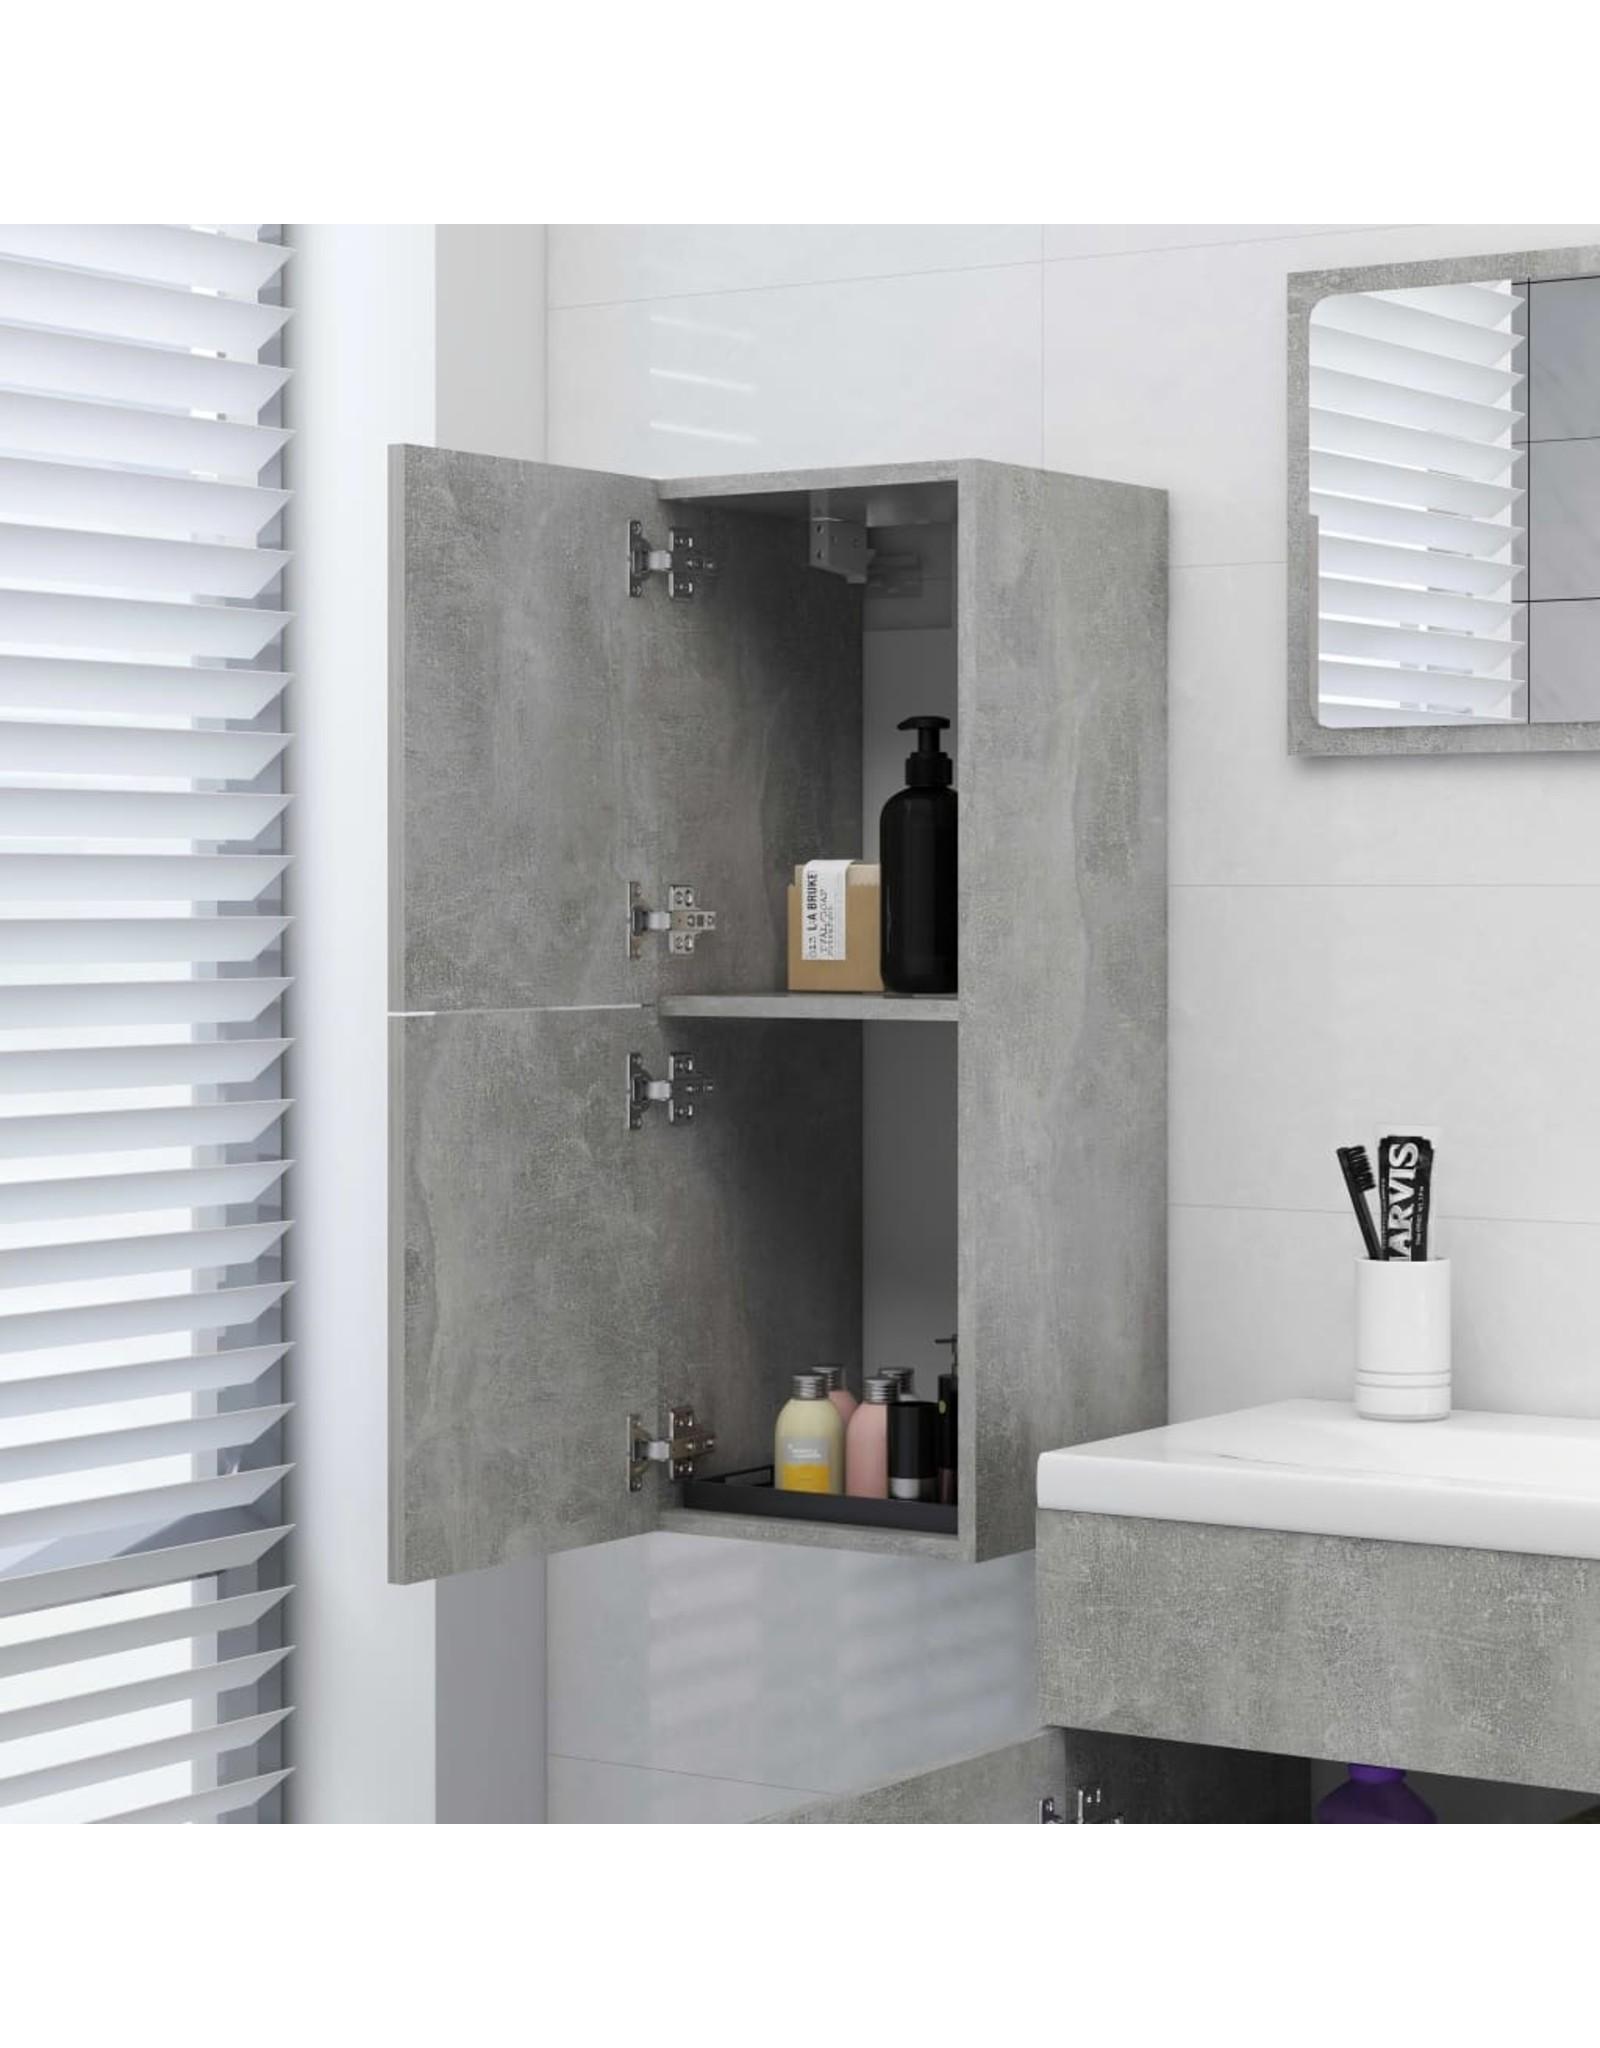 Badkamerkast 30x30x80 cm spaanplaat betongrijs